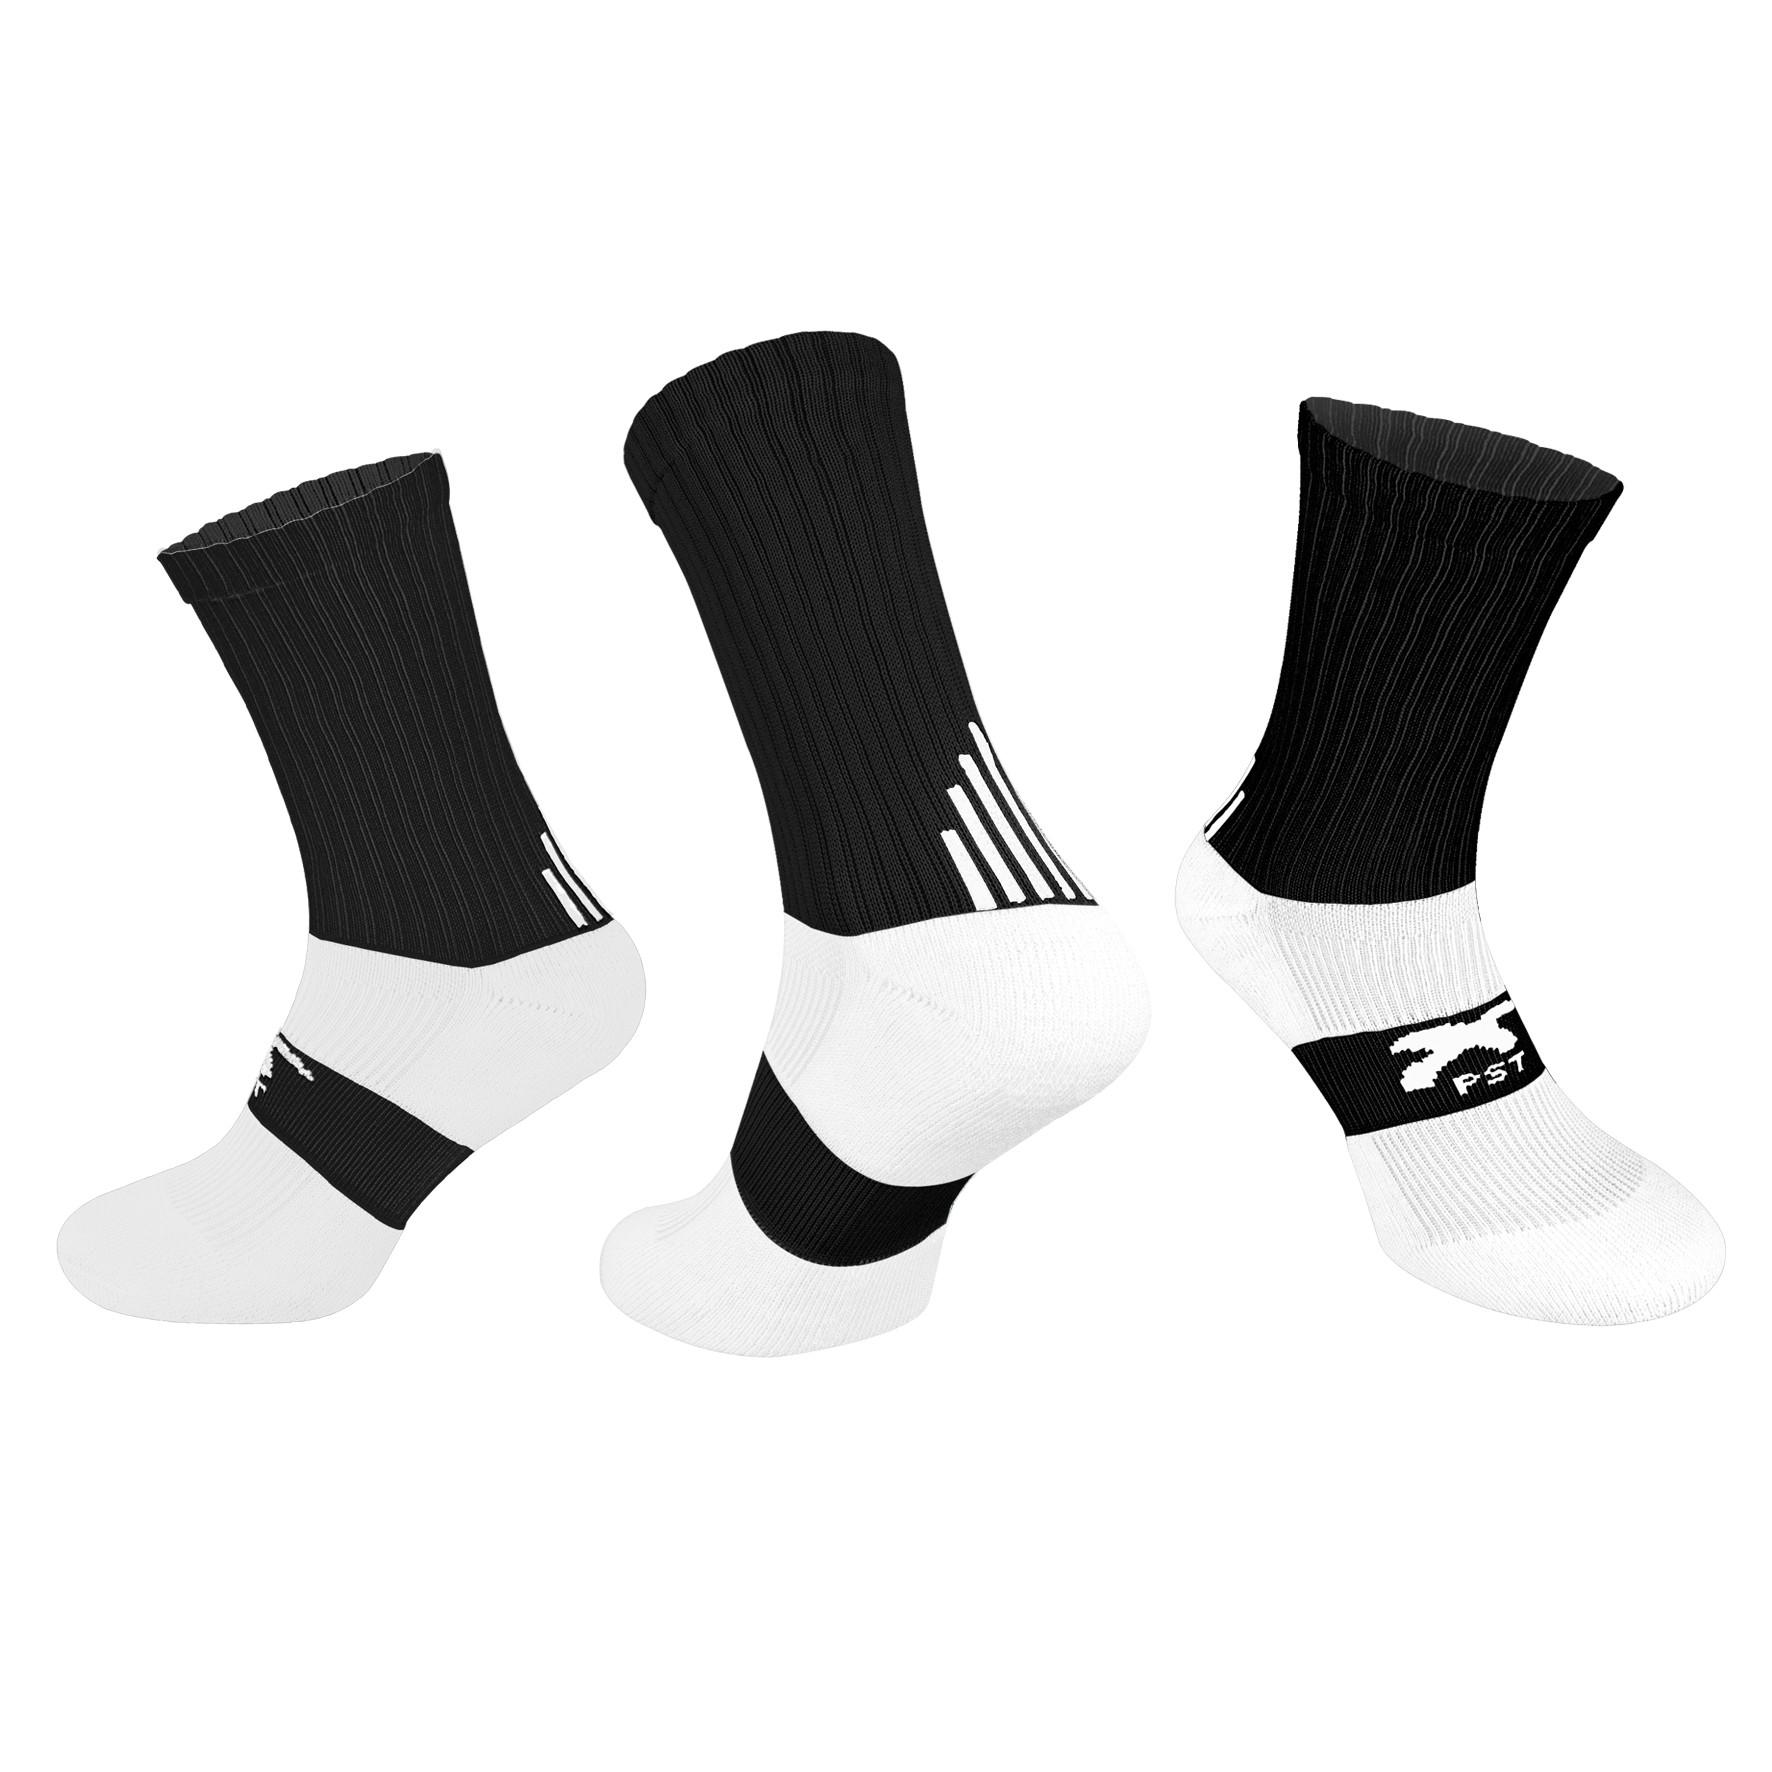 PST Crew Socks - Black